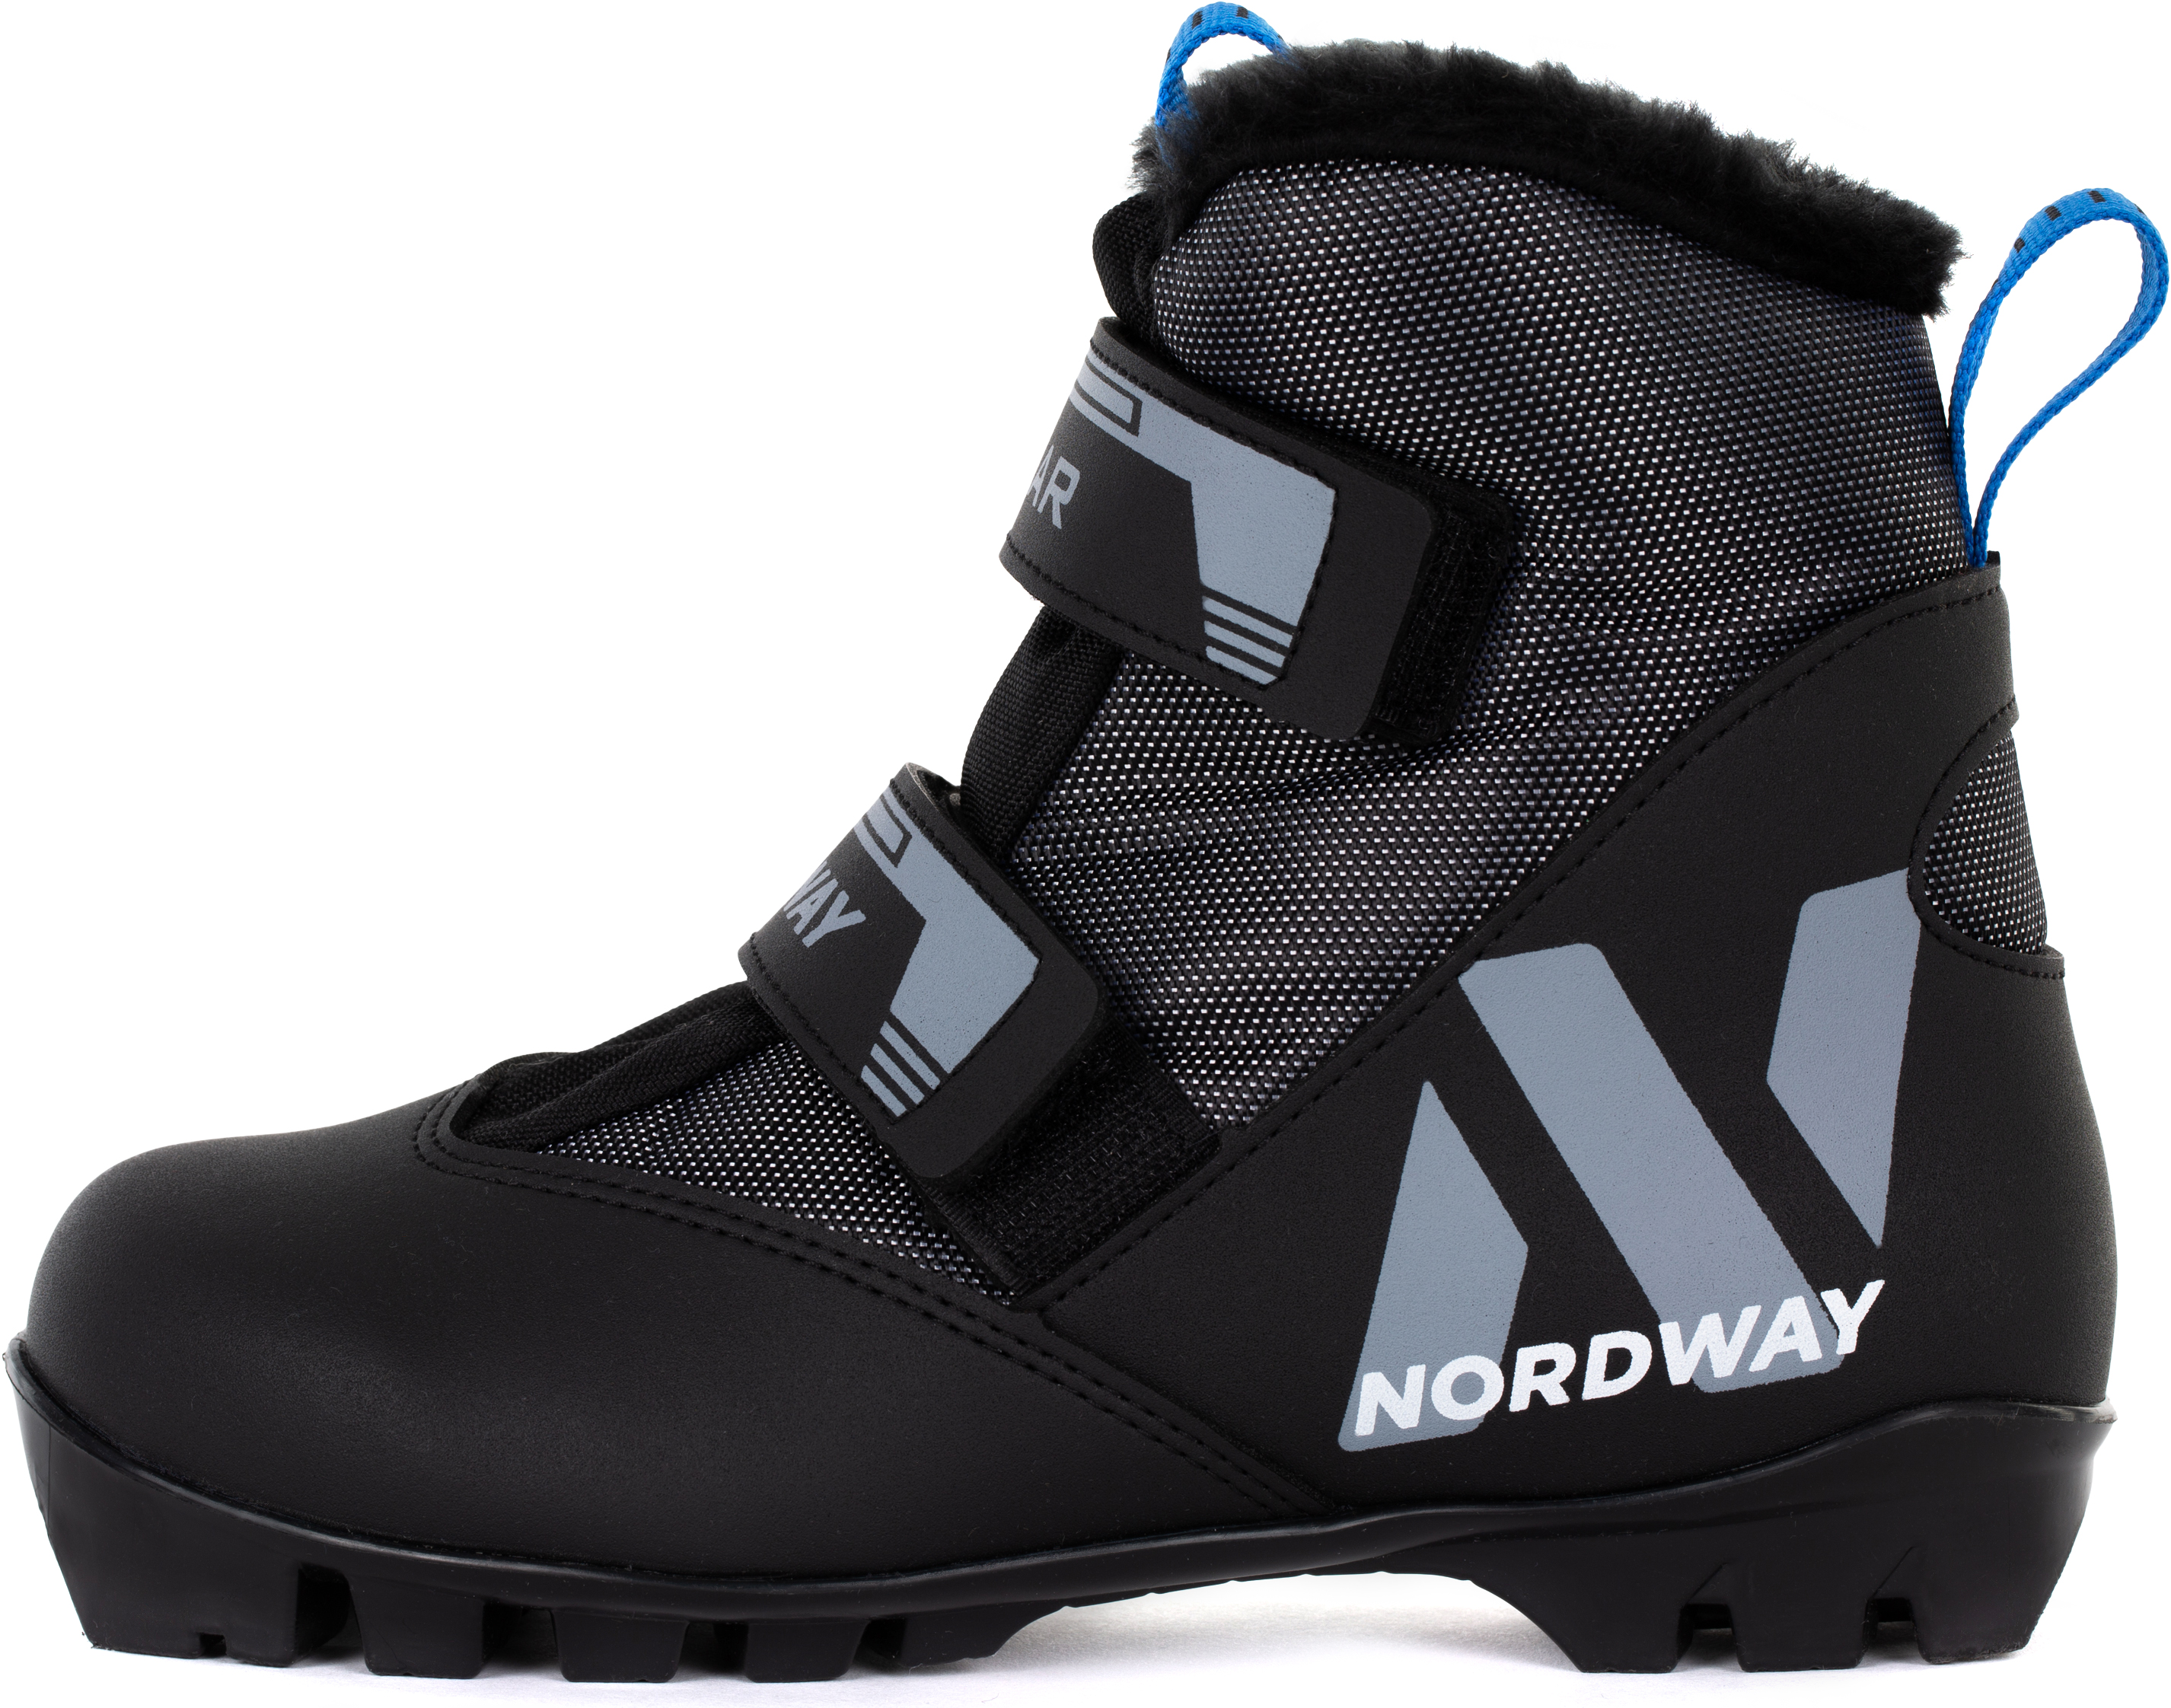 Nordway Polar NNN Kids cross-country ski boots